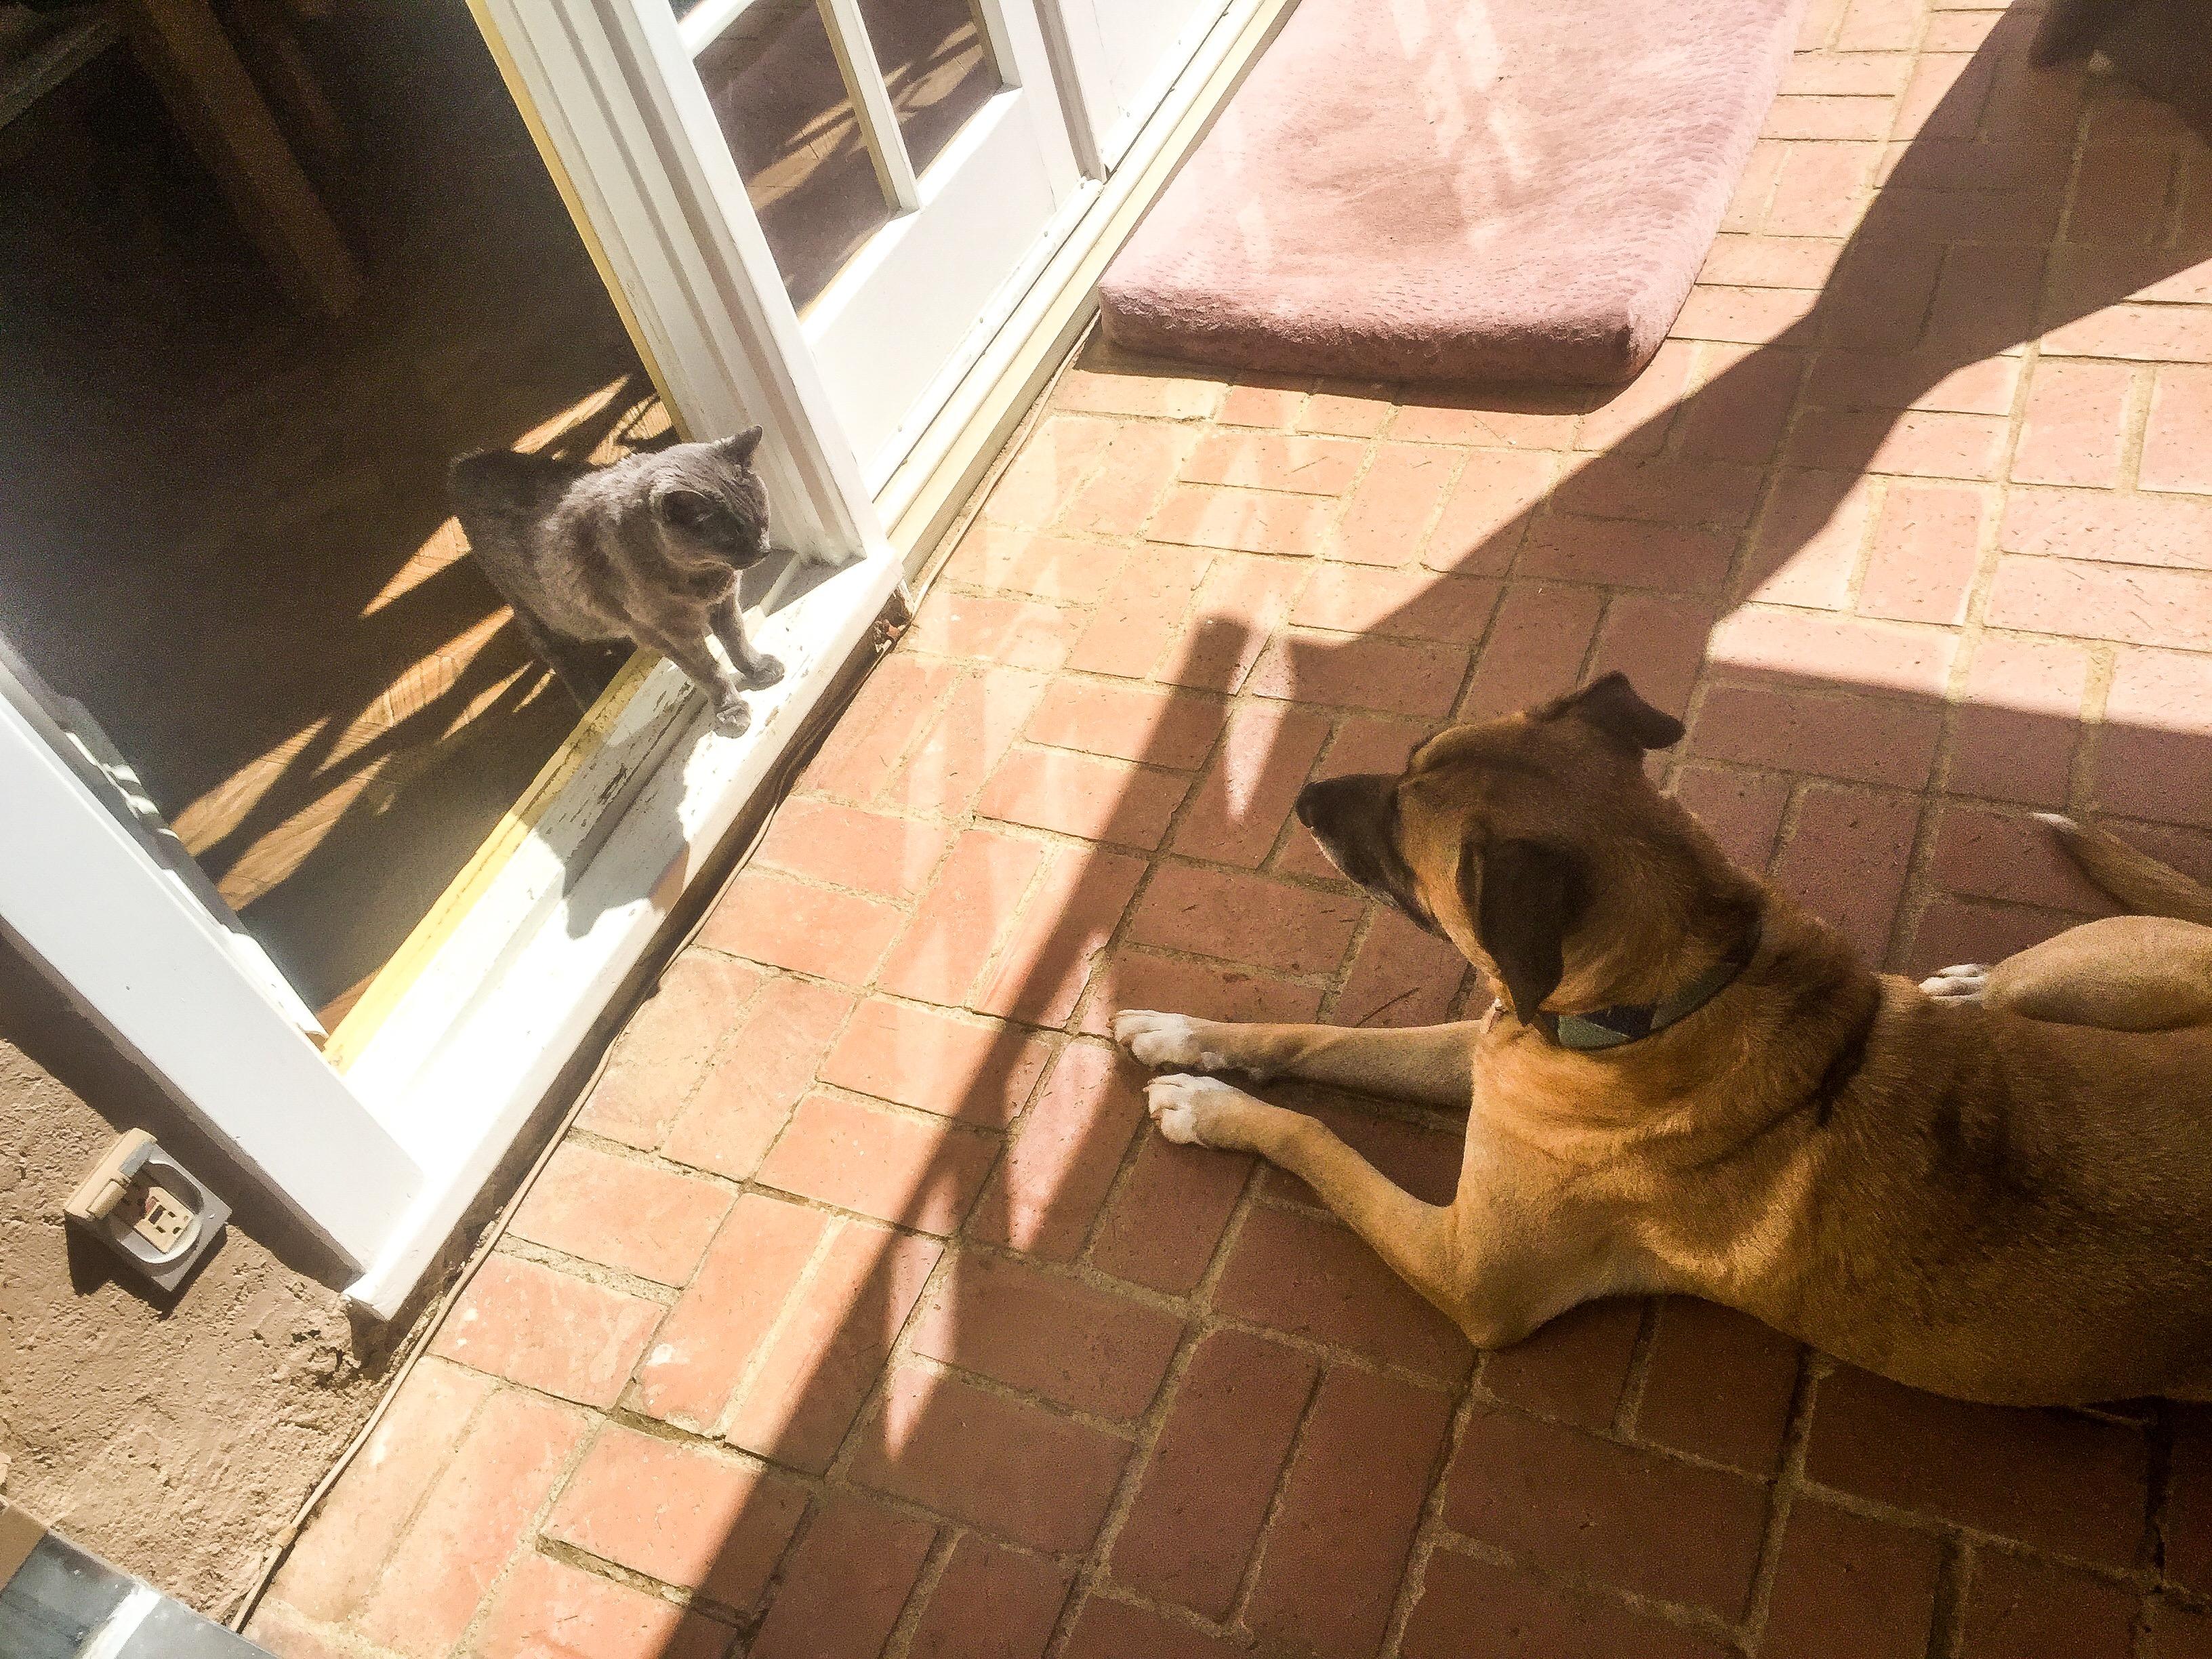 dog-cat-hollywood-rescueanimals-janne-kindberg